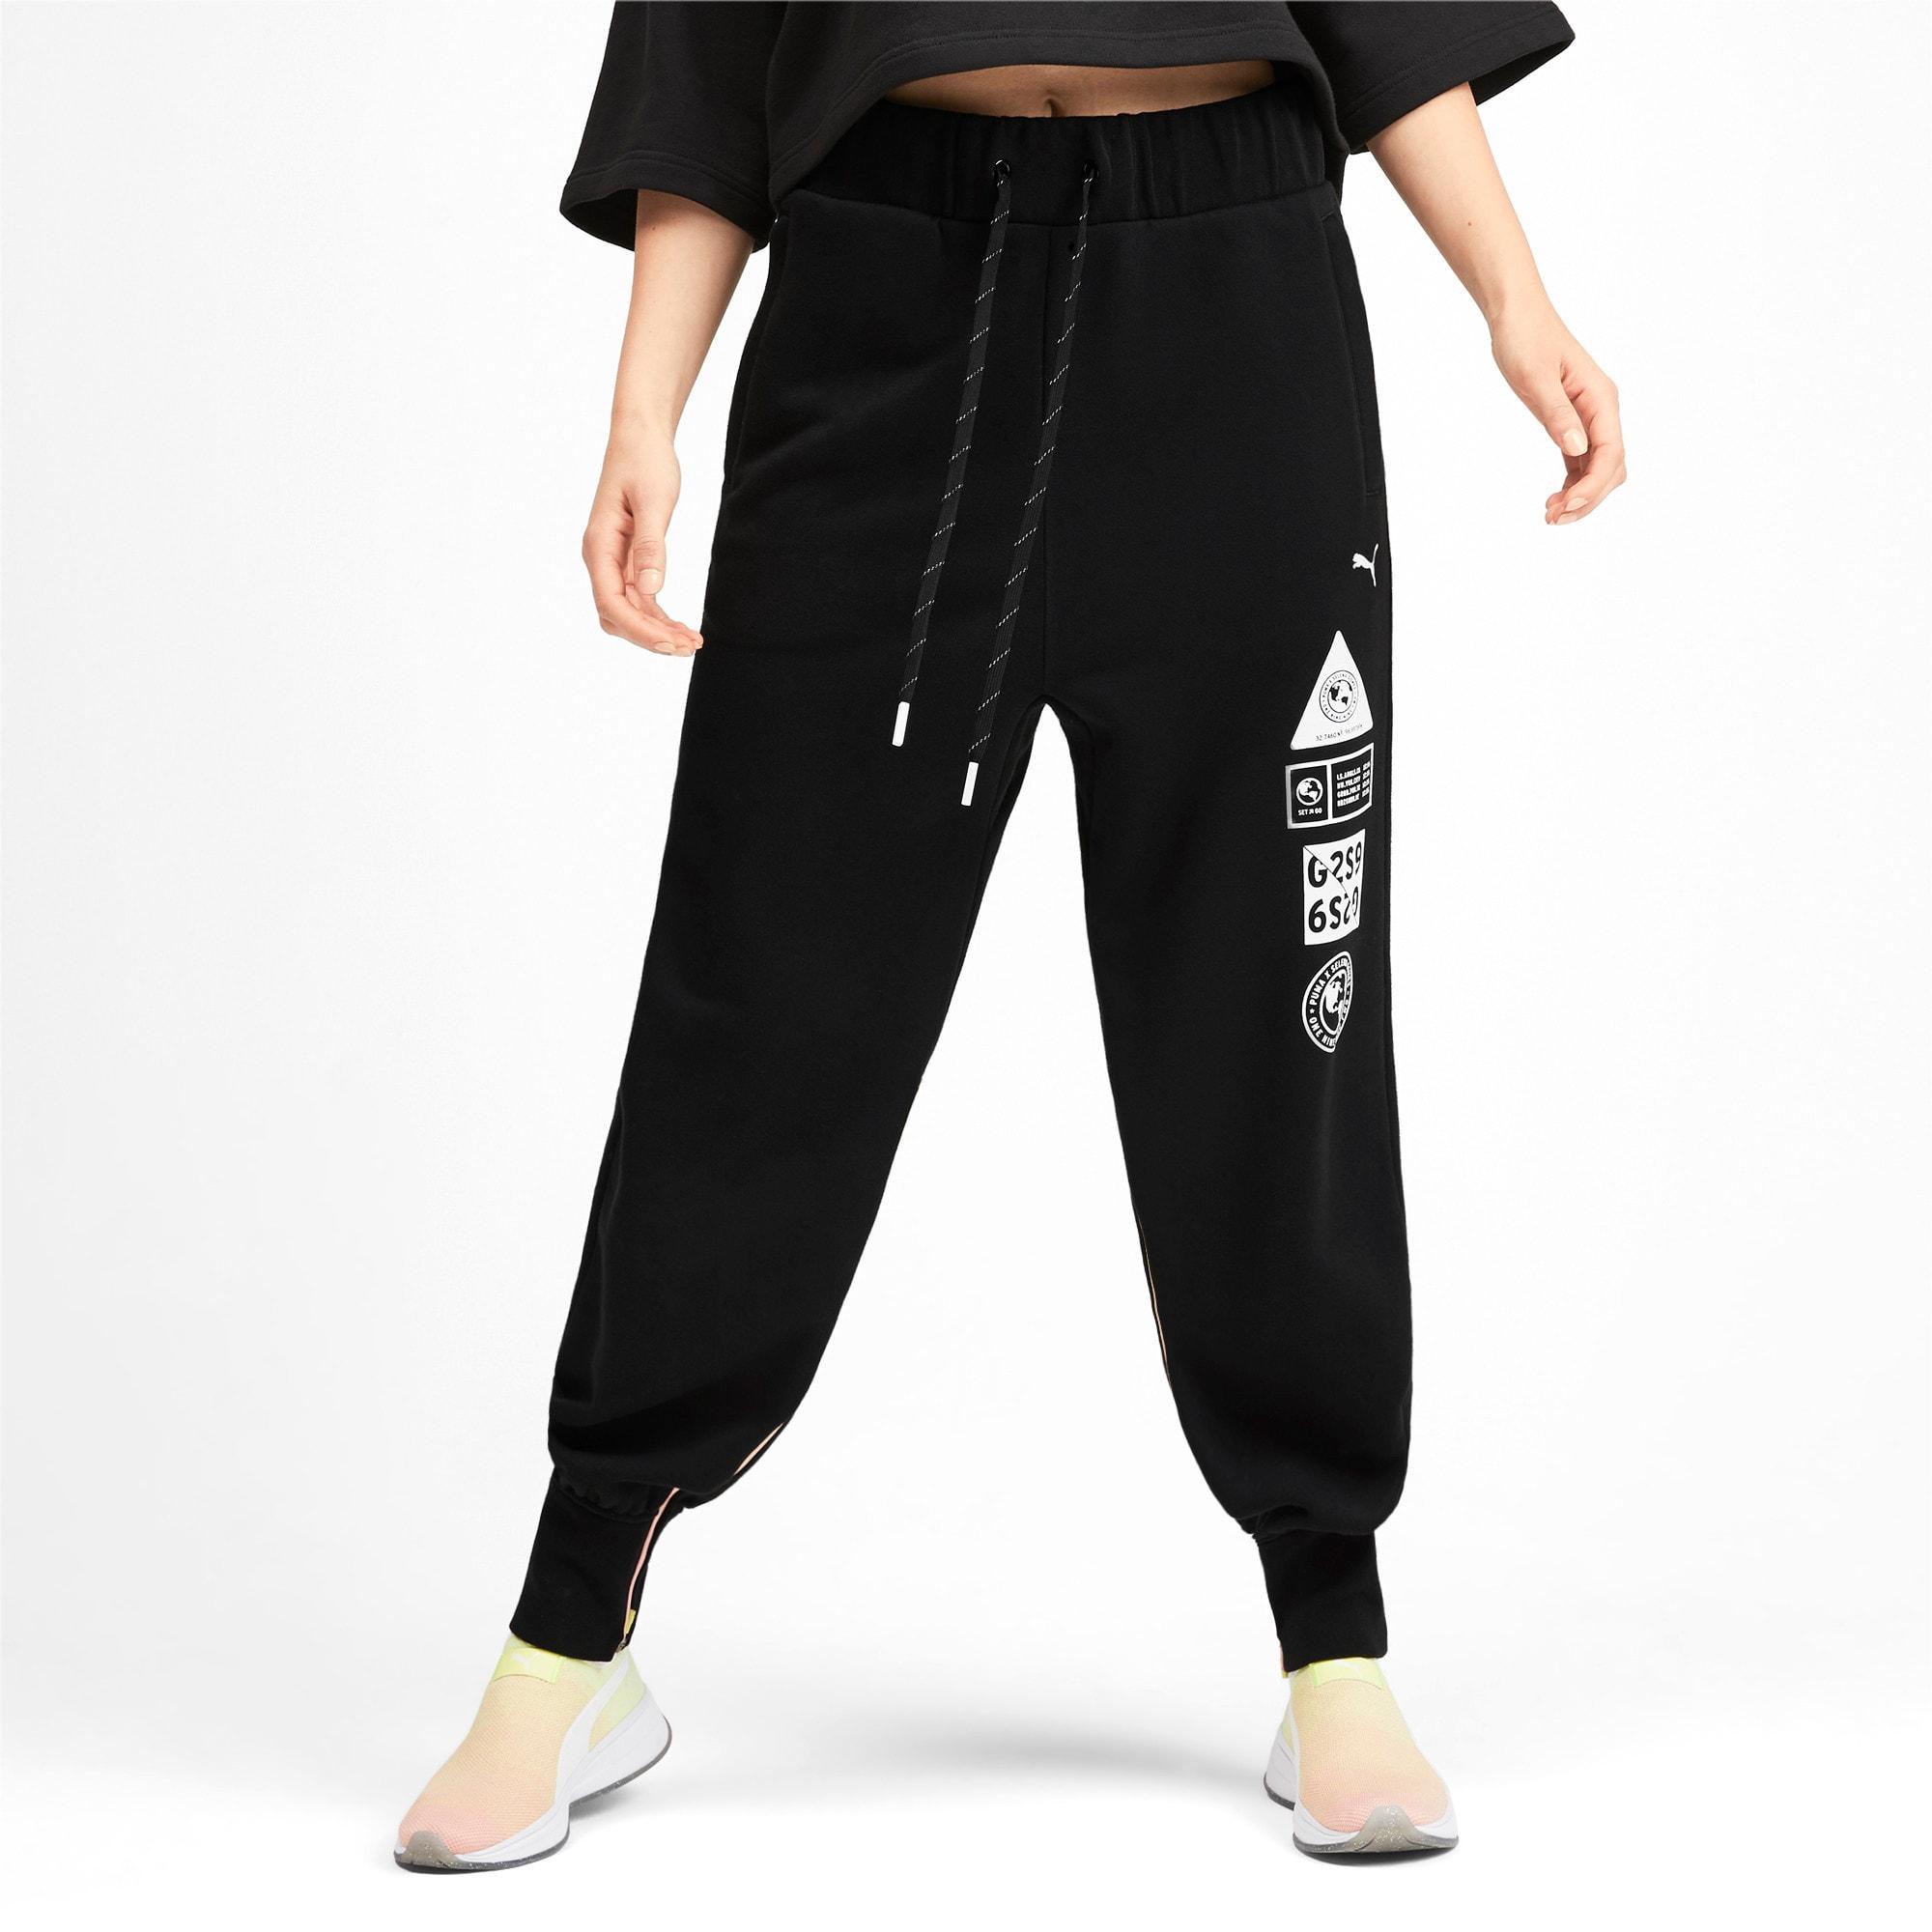 Thumbnail 1 of PUMA x SELENA GOMEZ Women's Sweatpants, Puma Black, medium-IND